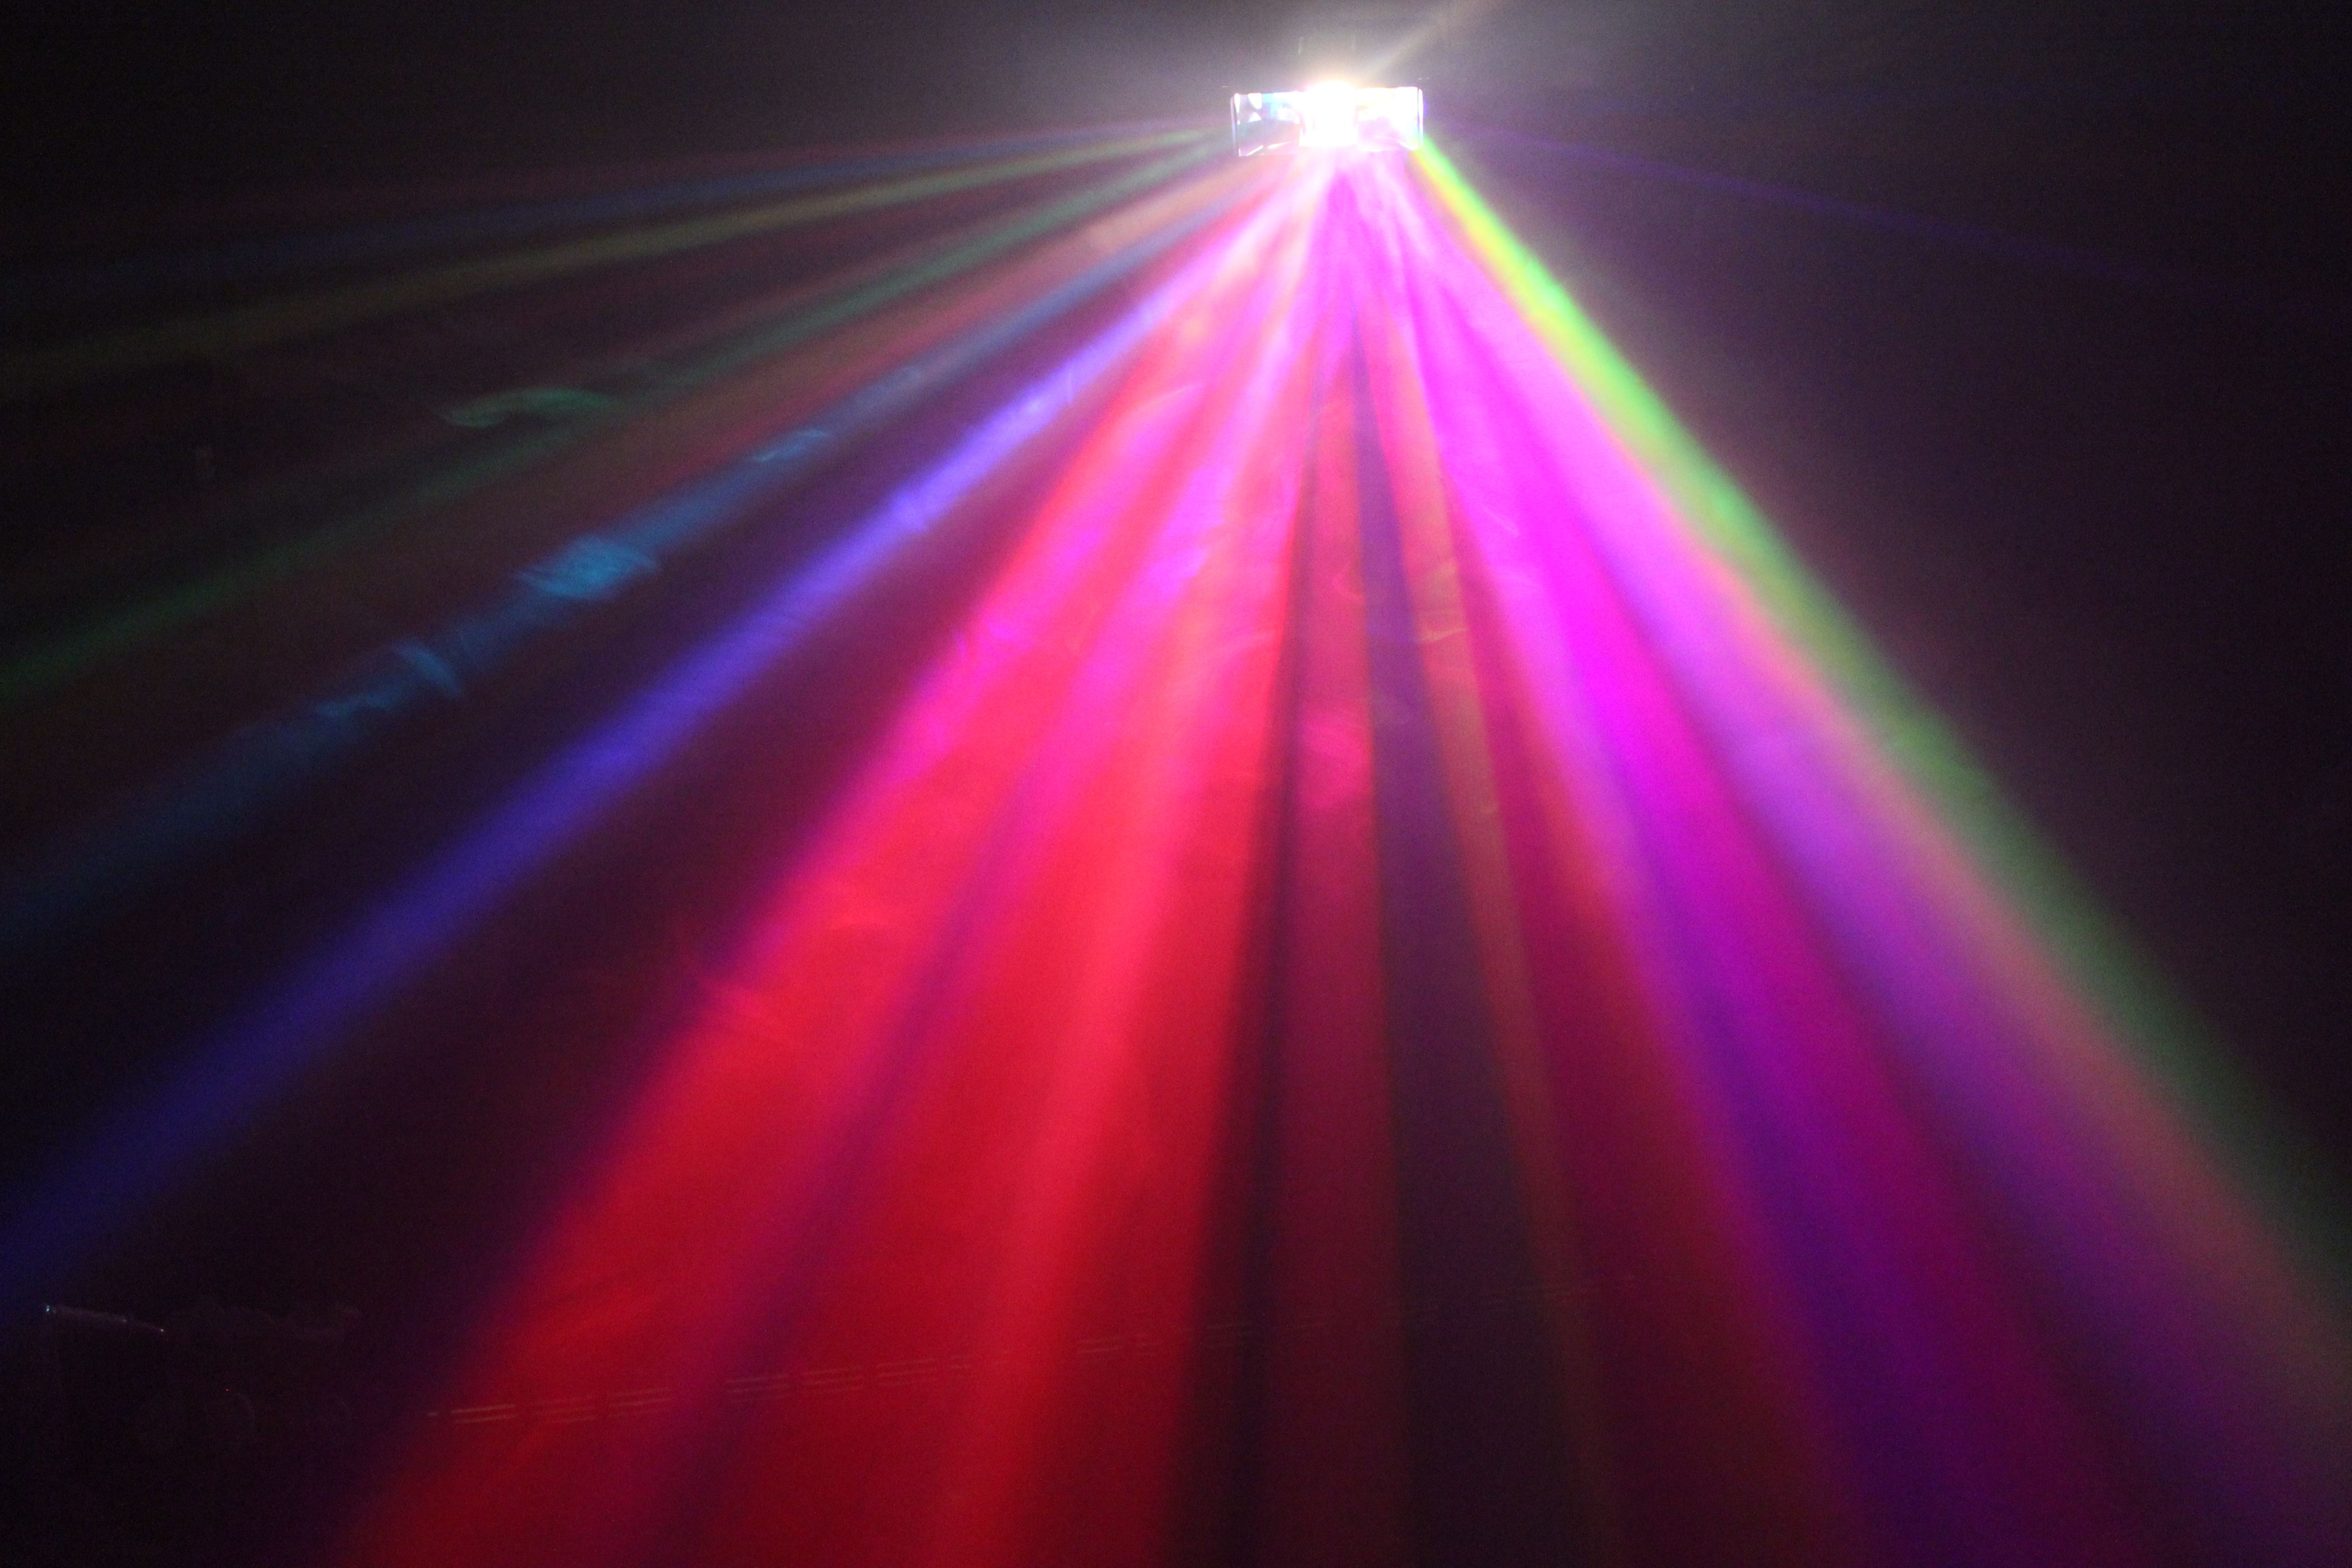 beautiful american luxur the lamps dj of lights lighting wallpaper background wallpapers widescreen light